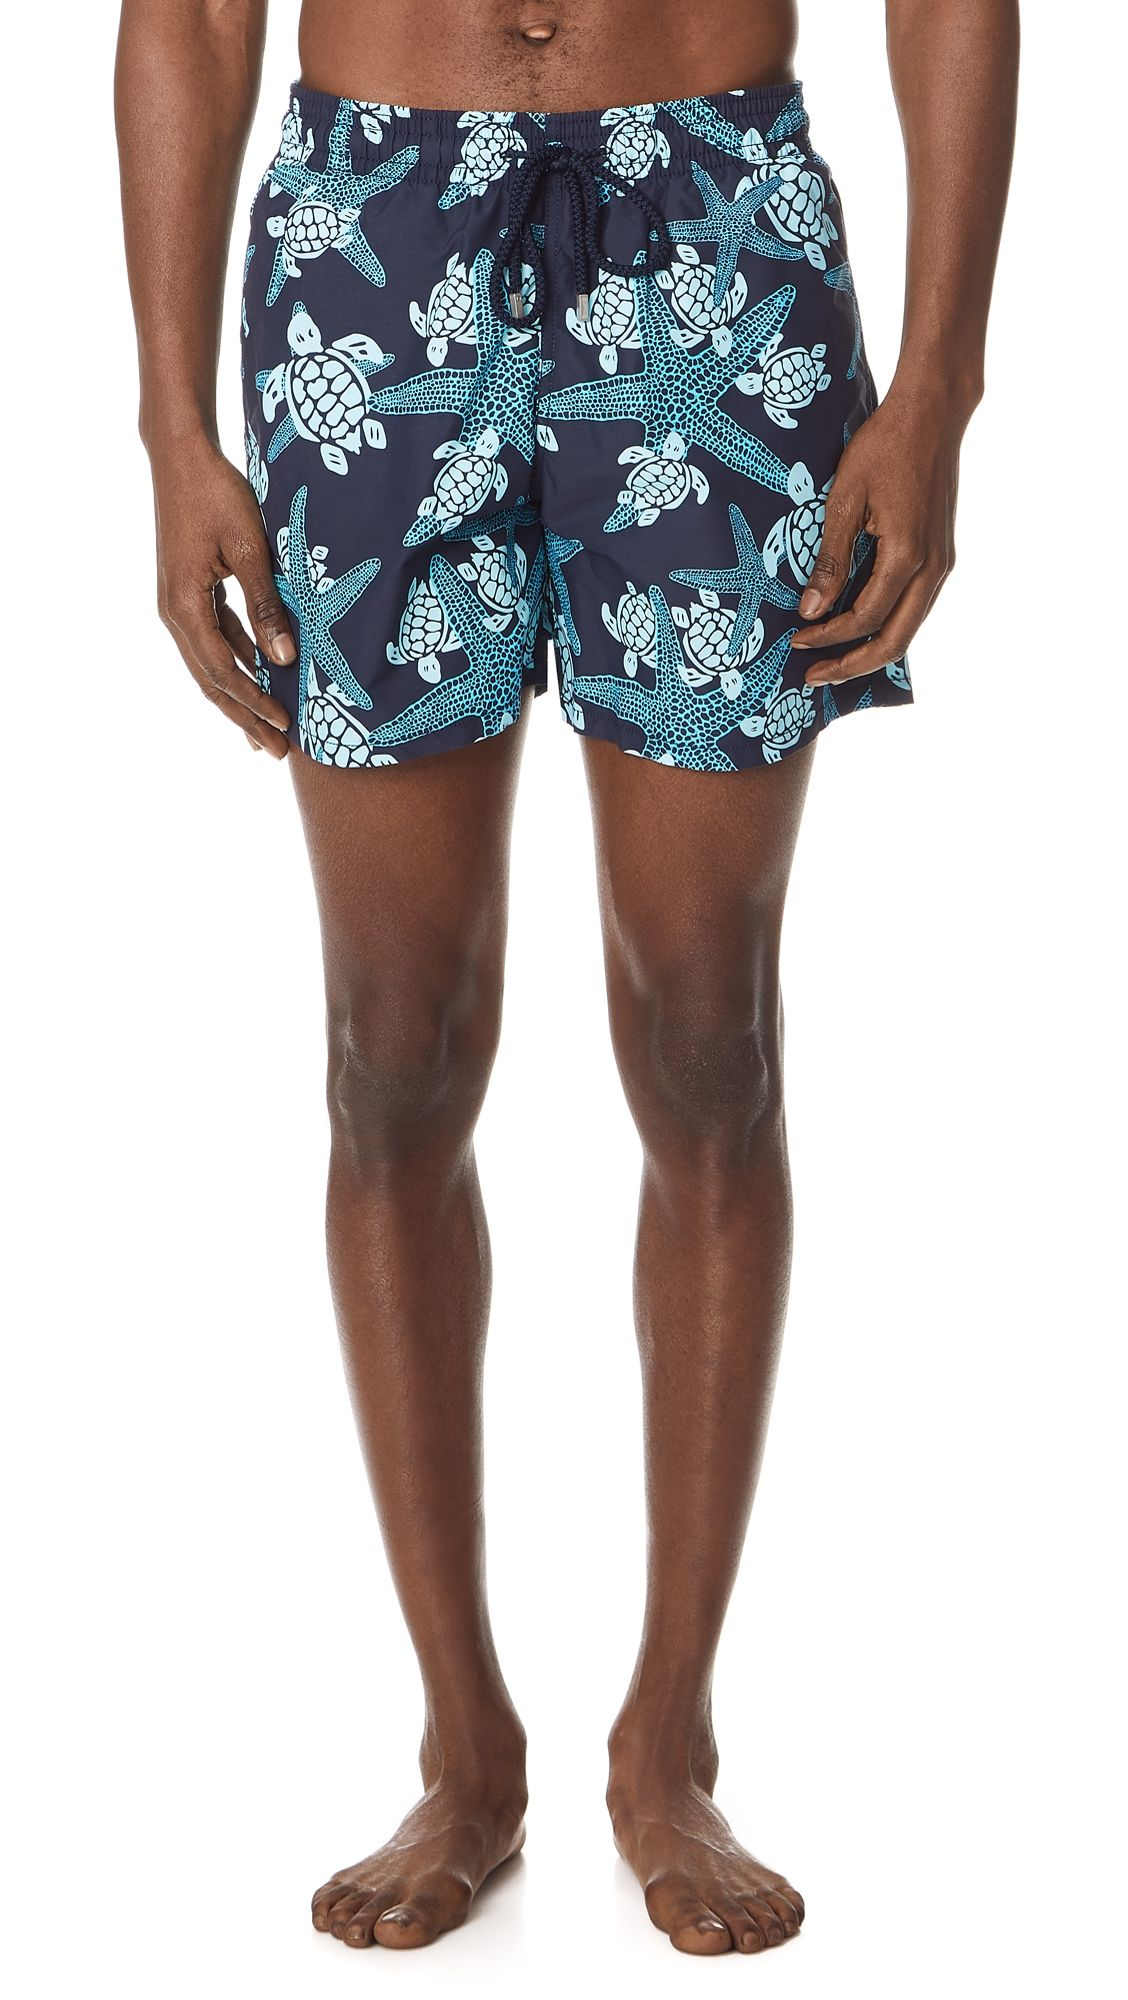 cbb67b327d Vilebrequin Starlettes & Turtles Trunks In Bleu Marine | Swim shorts ...